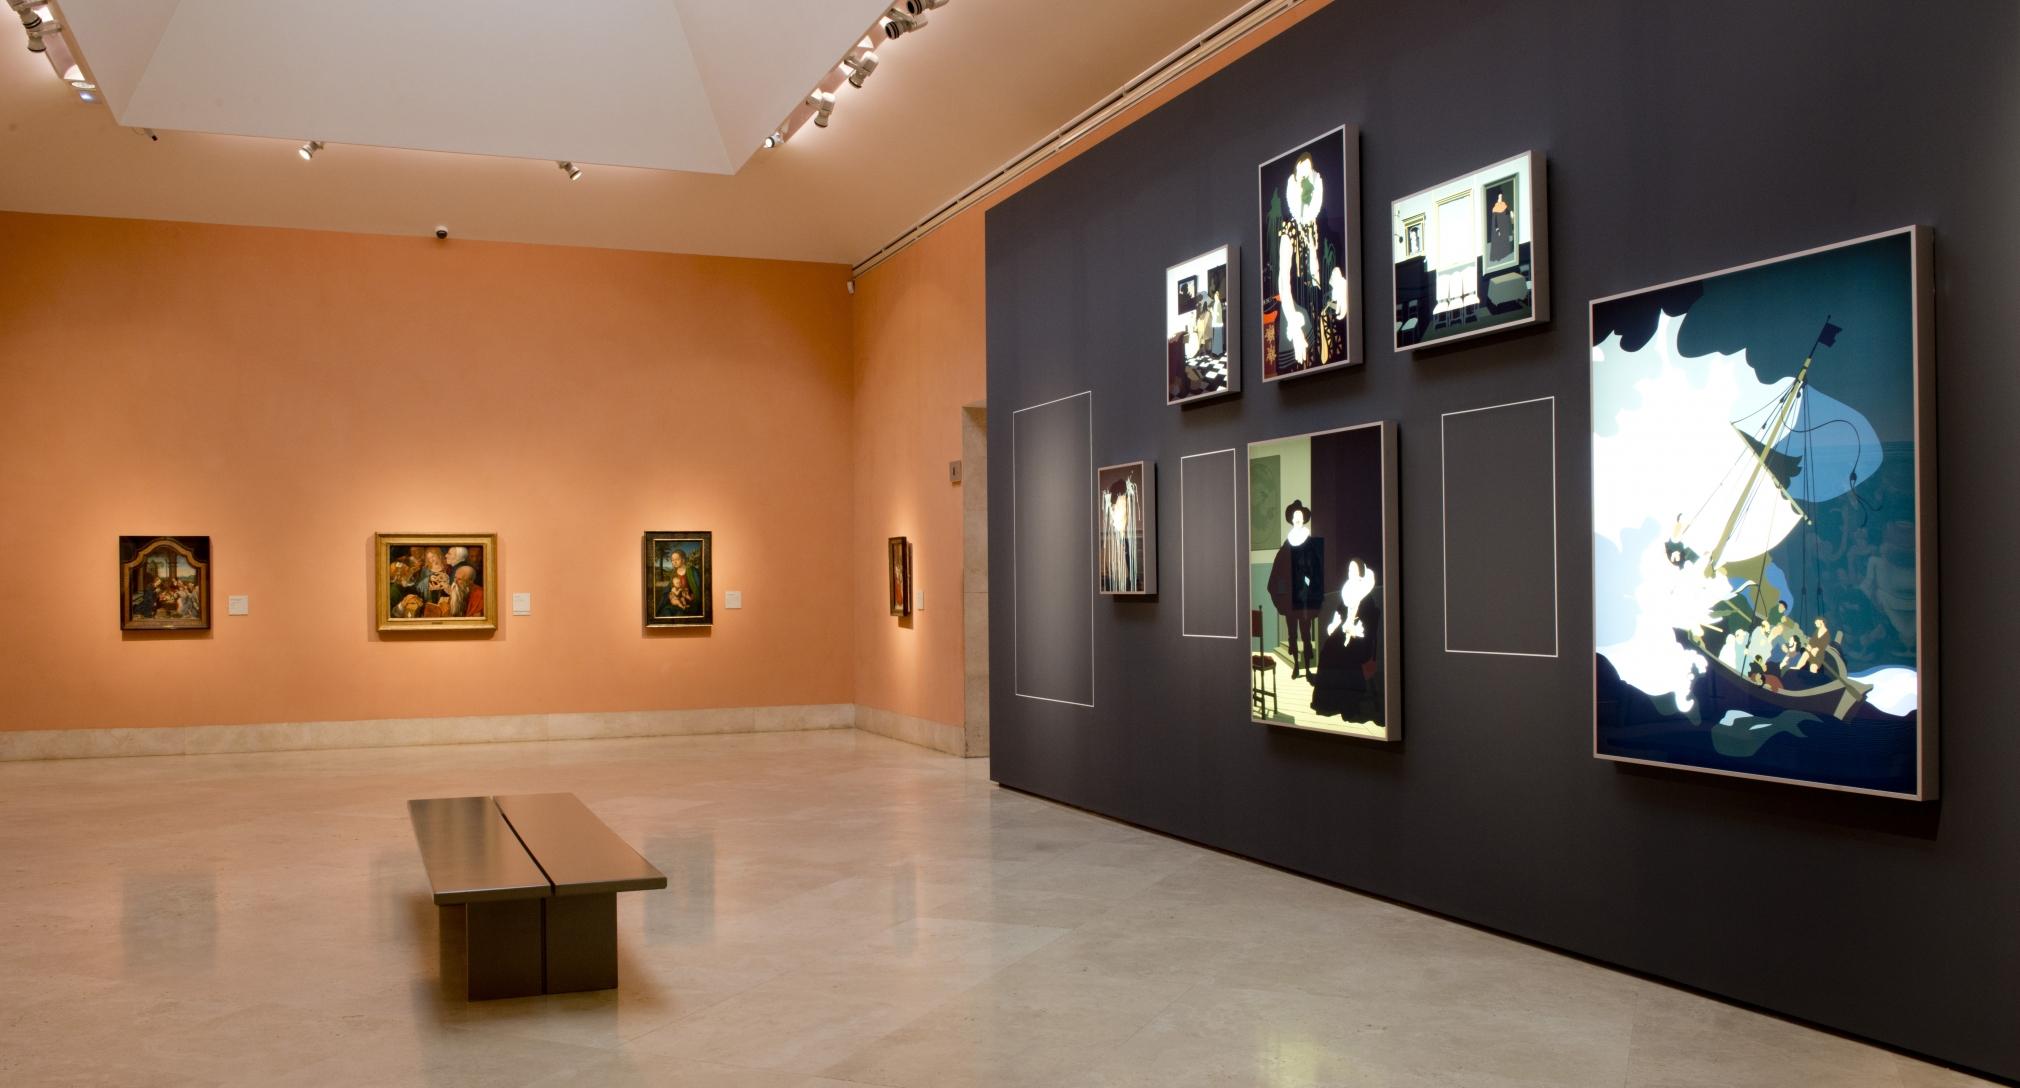 Kota Ezawa, installation view, Art Lesson , Thyssen Bornemisza Museum, Madrid, Spain, 2017